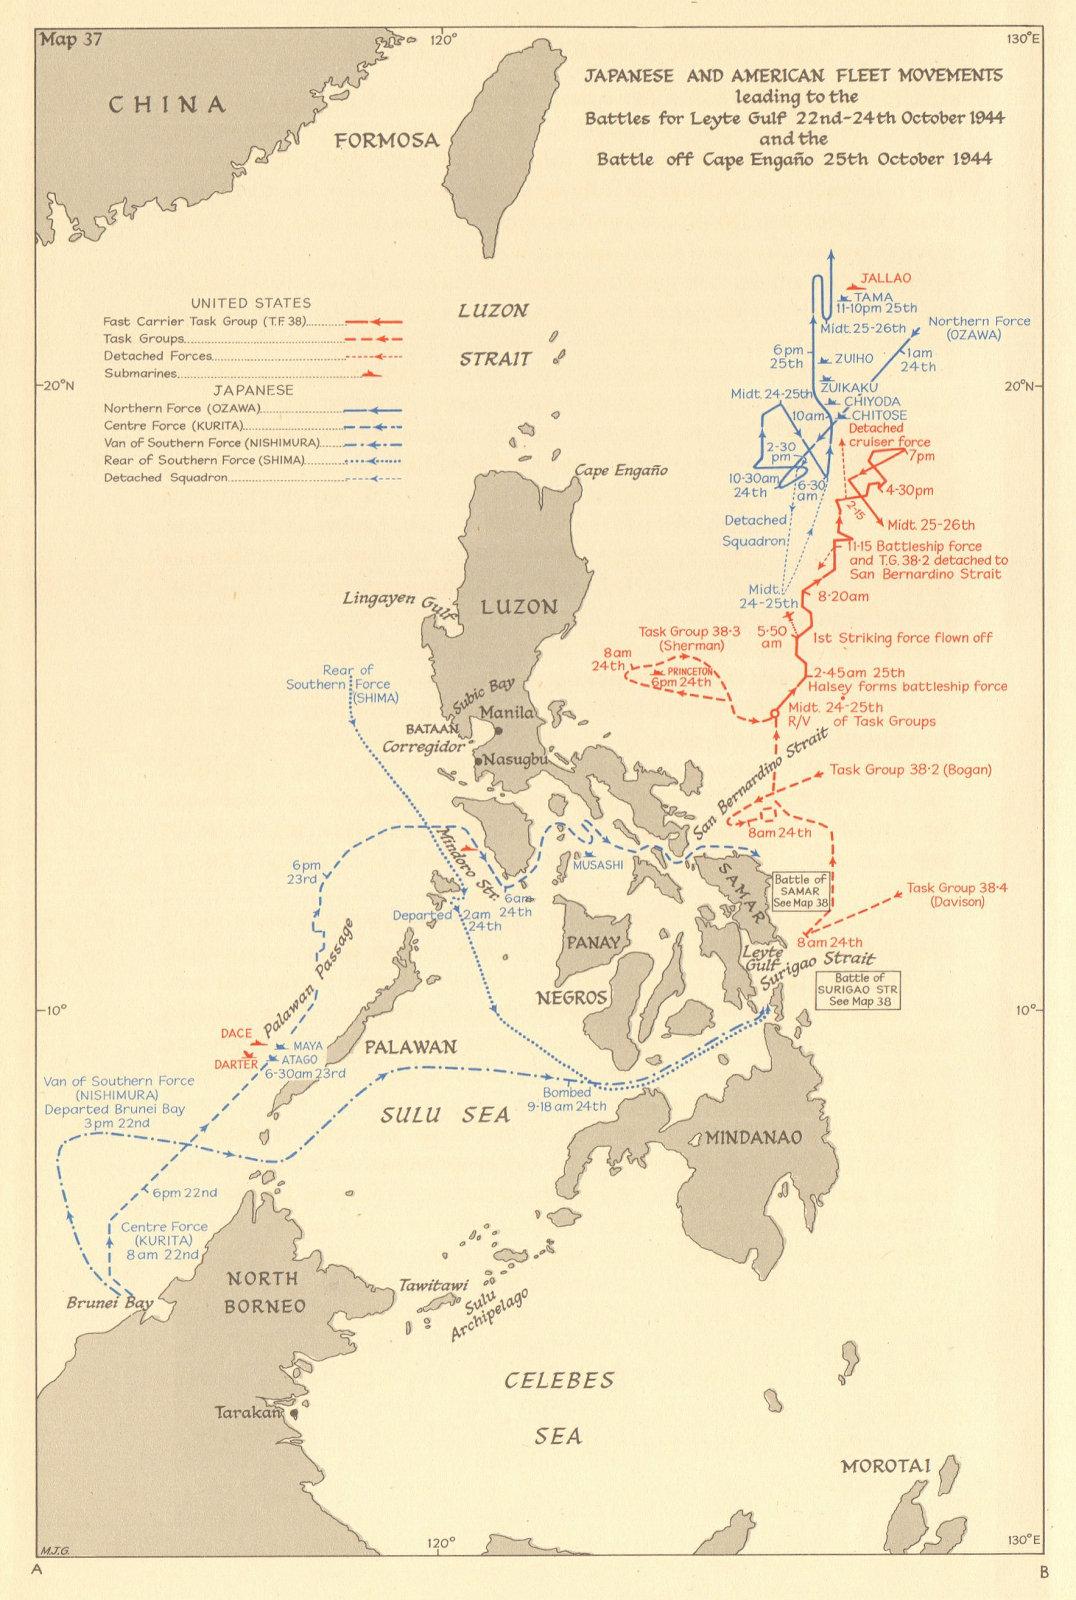 Philippines. Fleet movements. 1944 Battles of Leyte Gulf & Cape Engano 1961 map